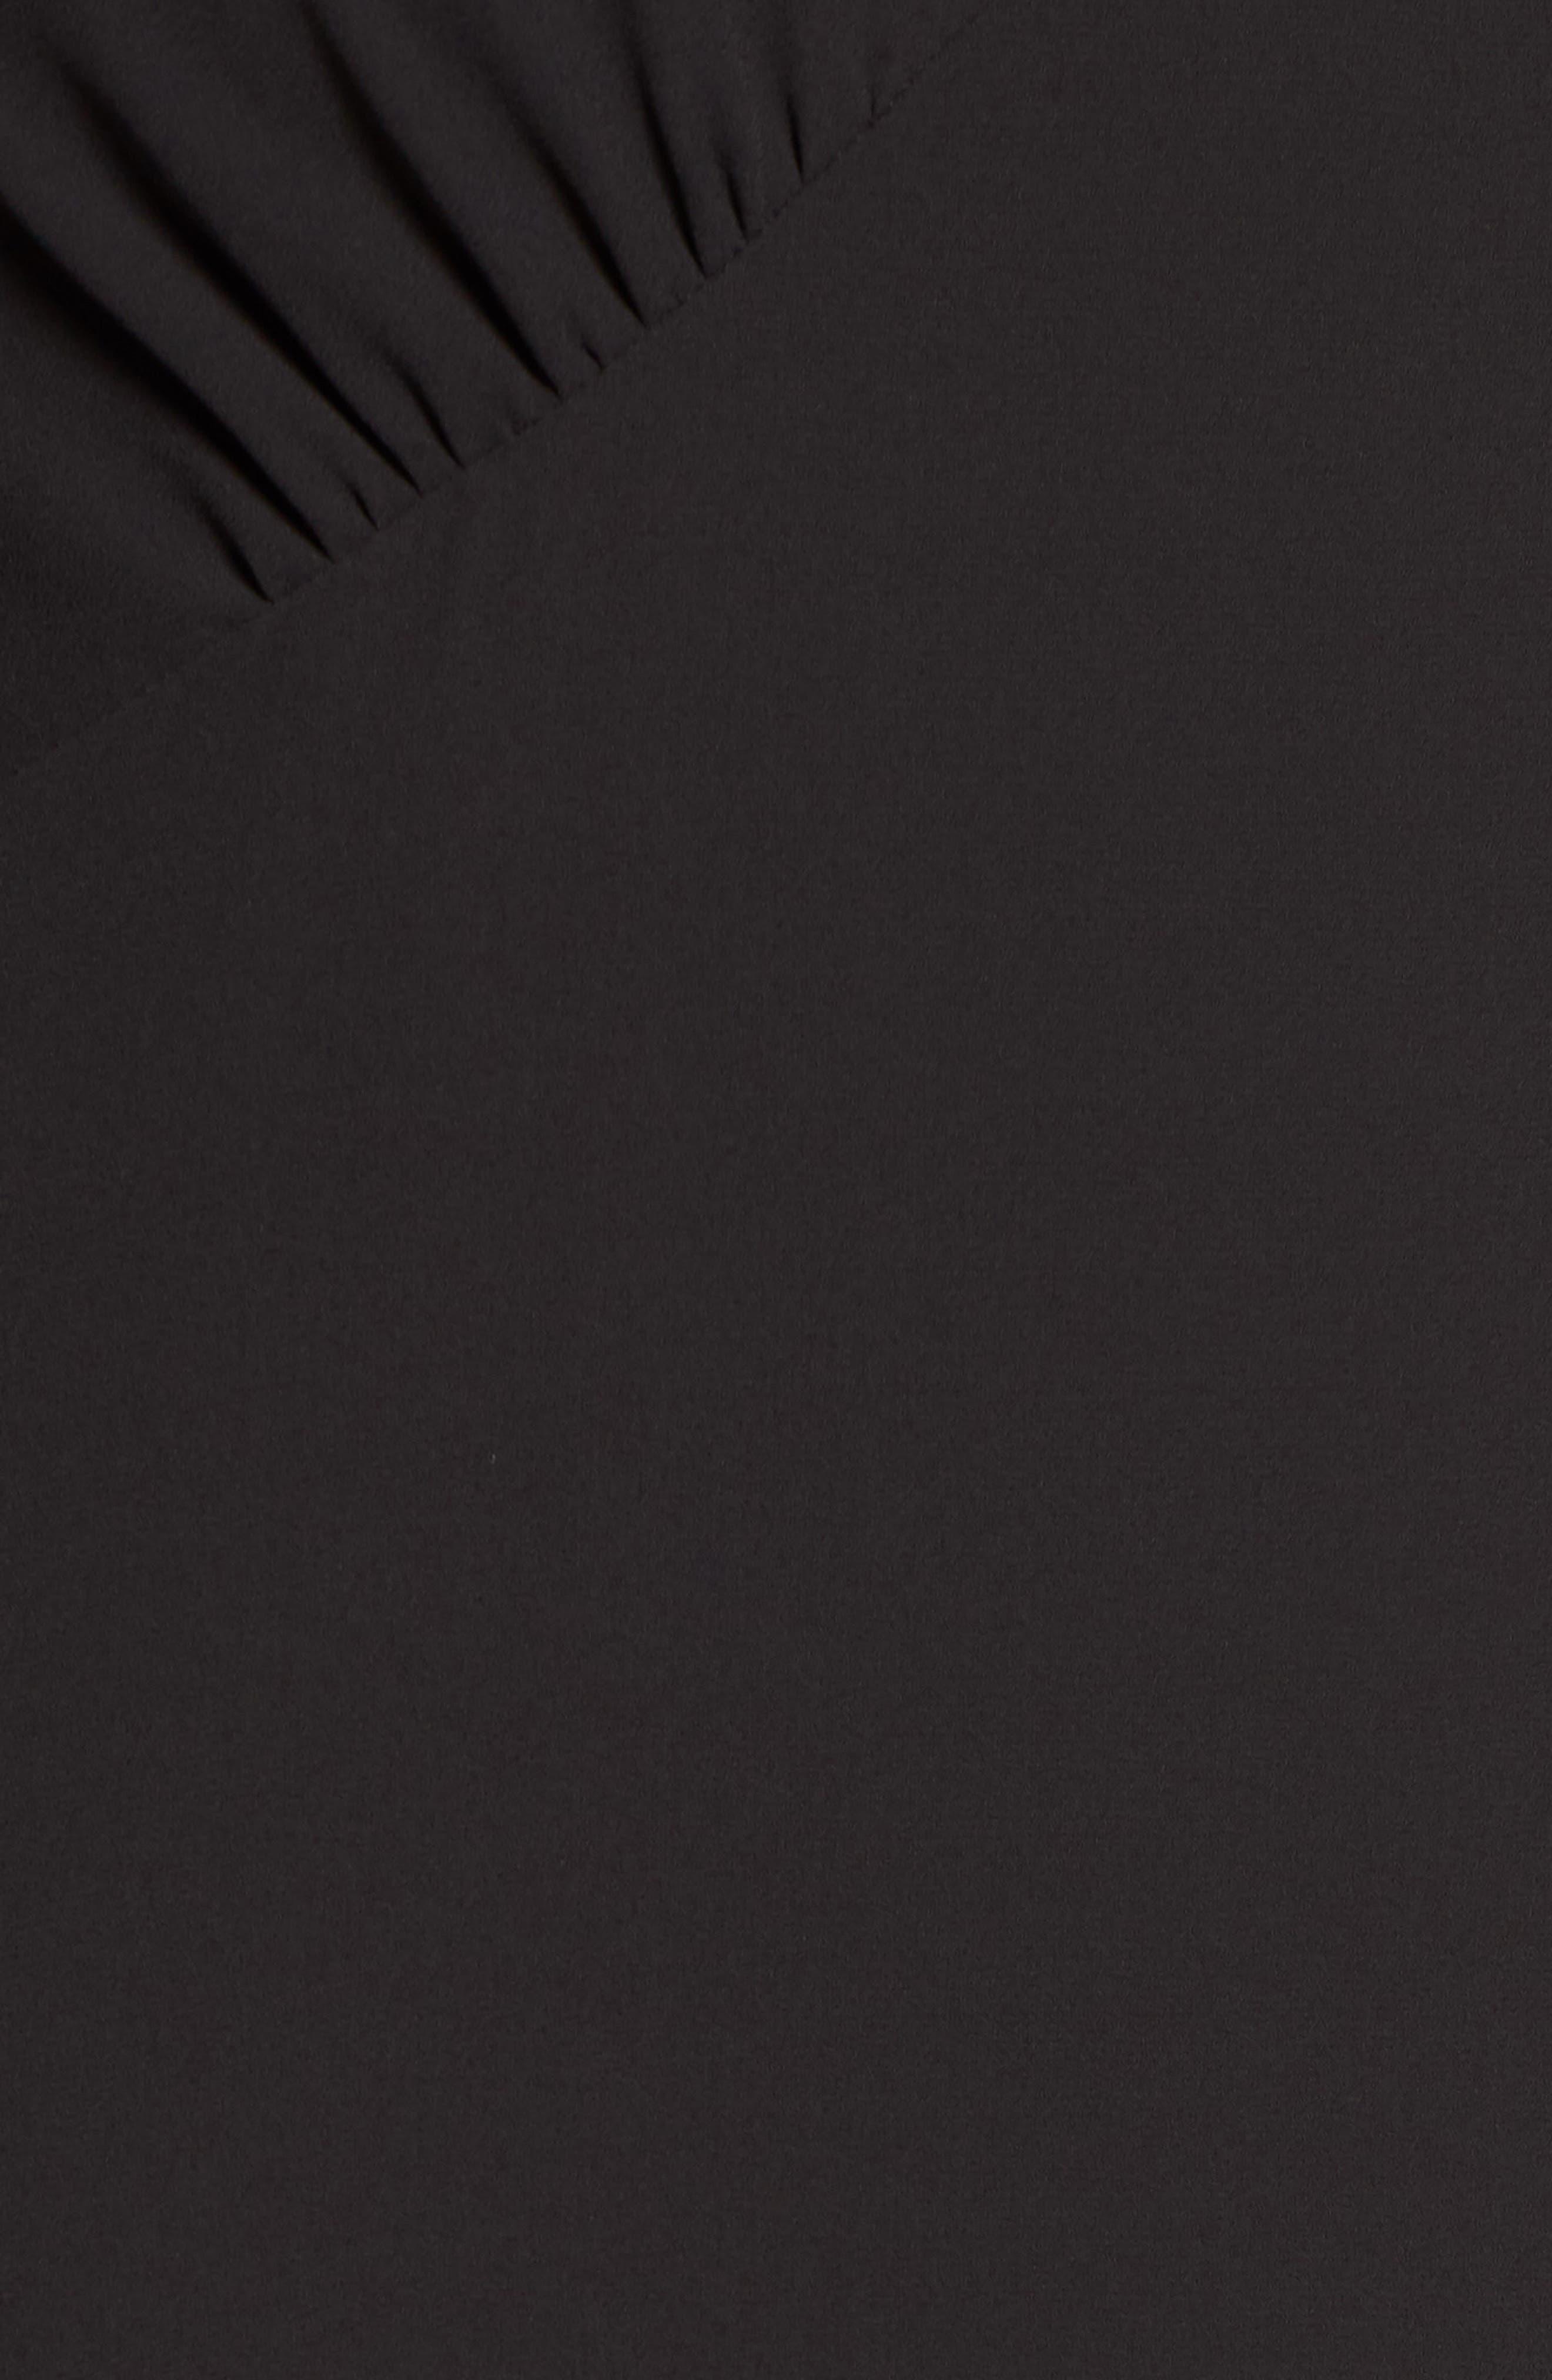 Daikon Cold Shoulder Dress,                             Alternate thumbnail 5, color,                             001